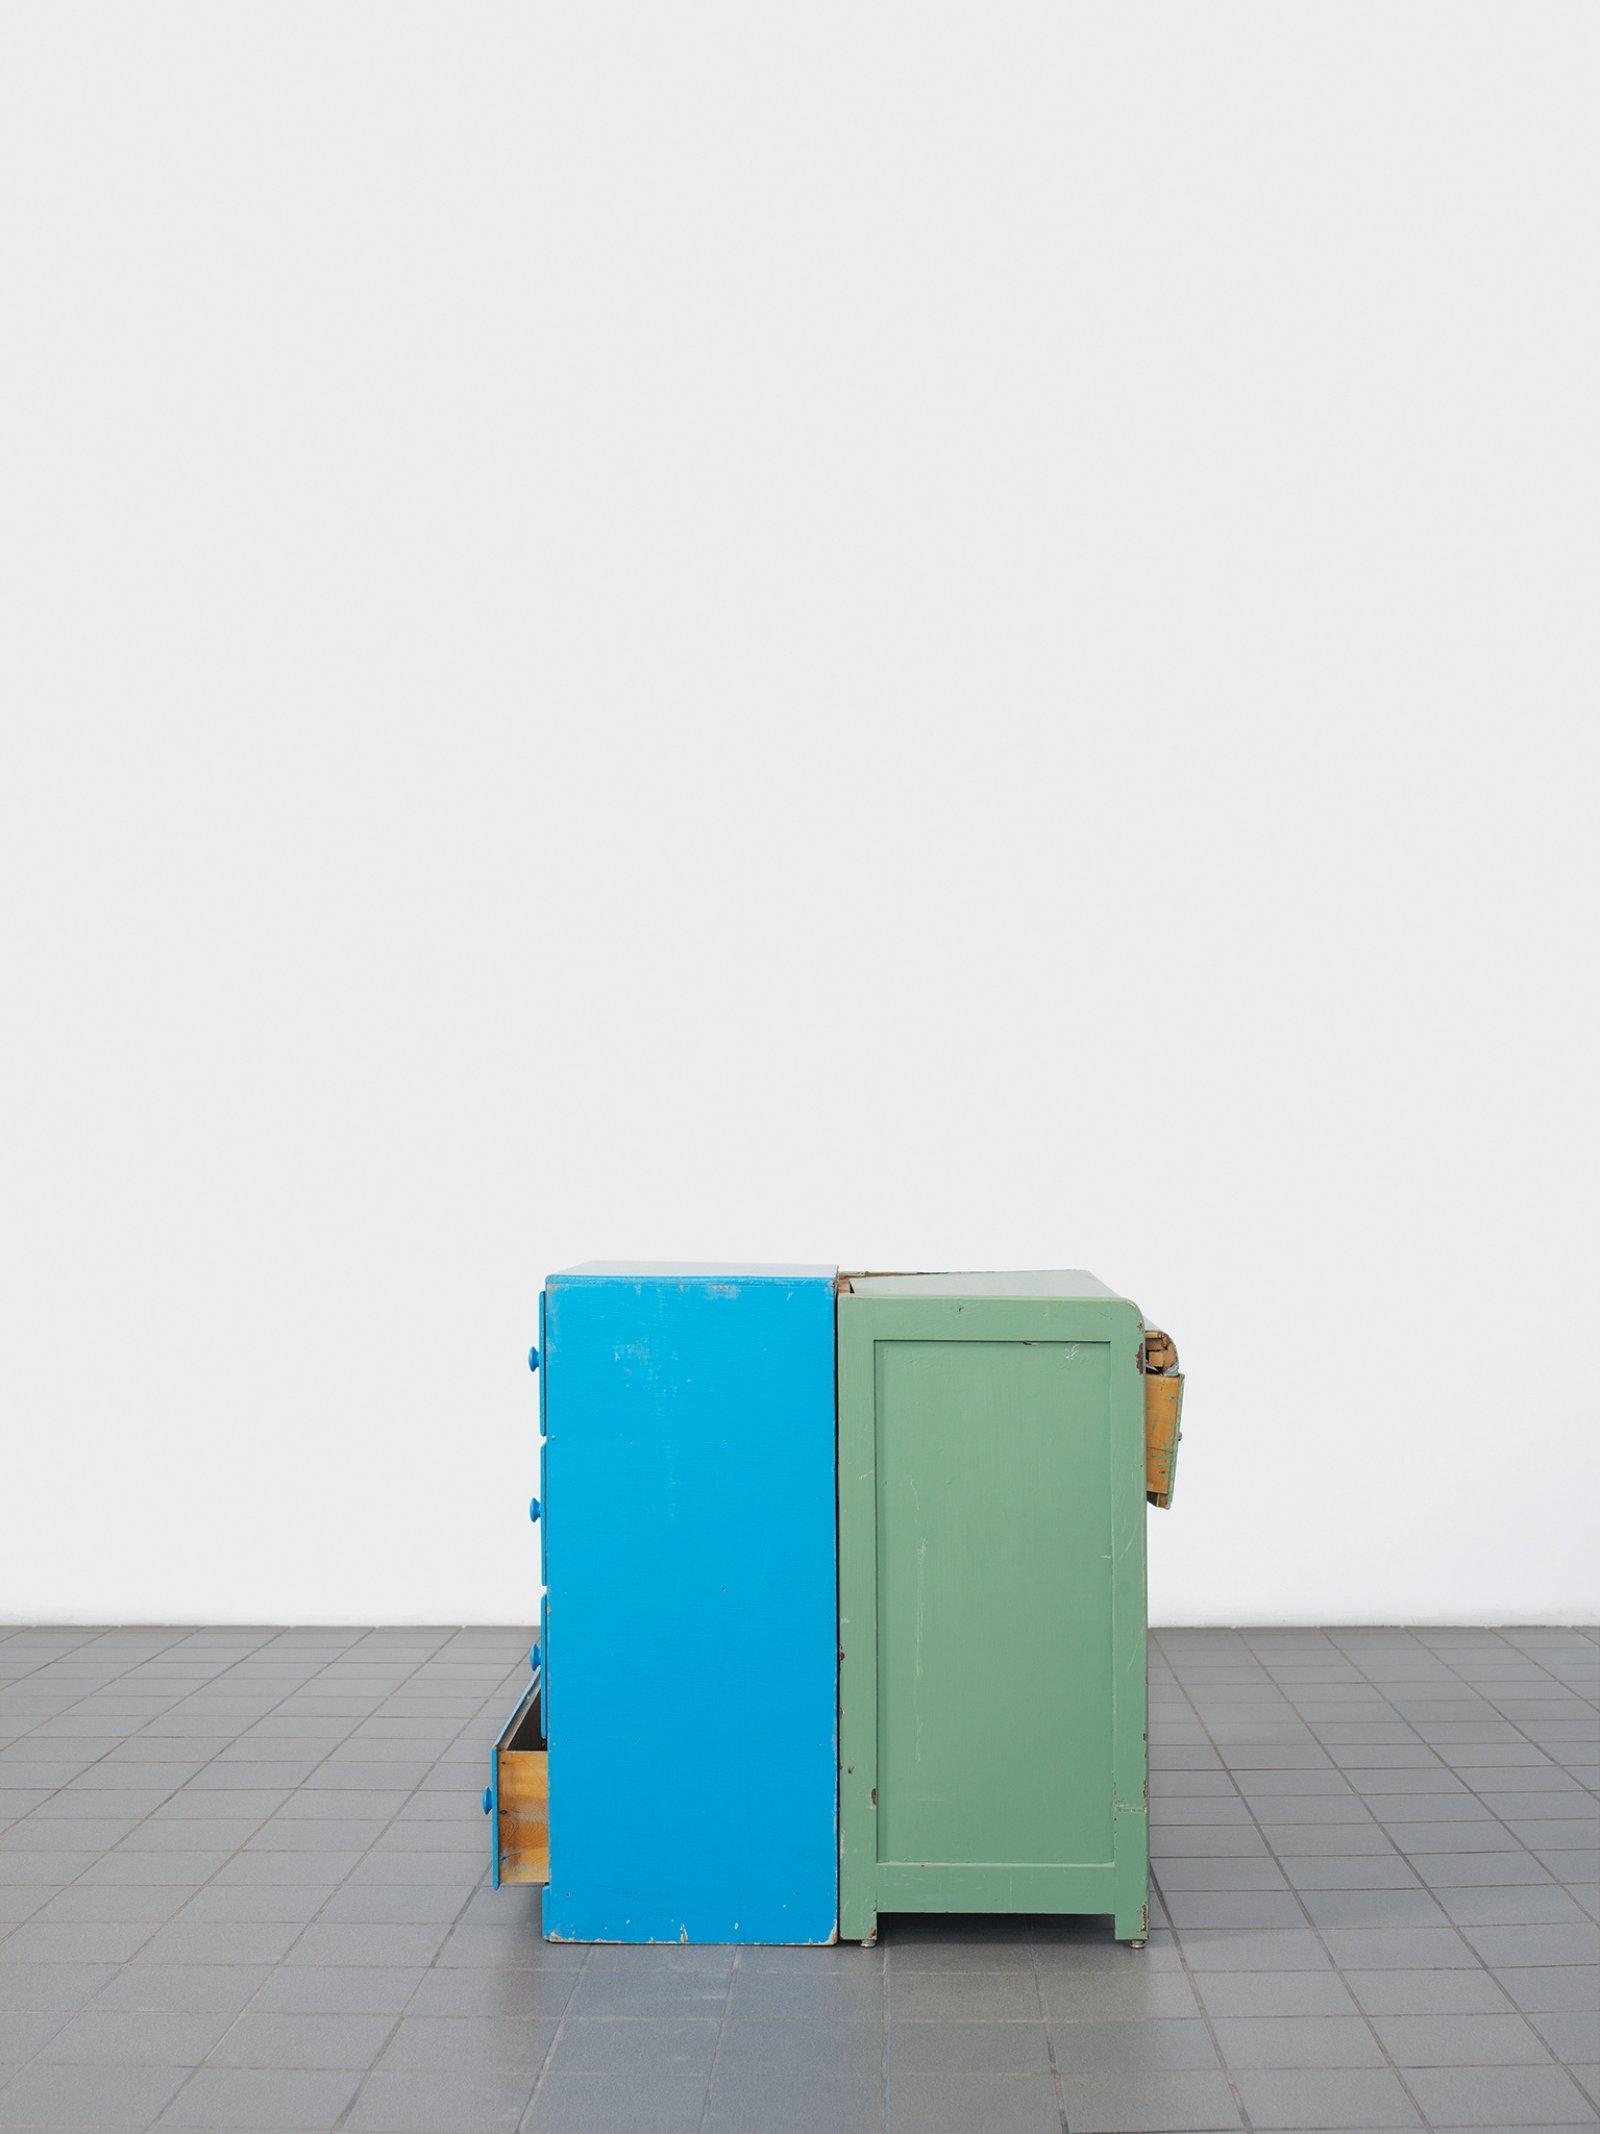 Geoffrey Farmer, Two Cavities (Pale Fire Freedom Machine), 2005, lightjet (endura archival photo paper), 50 x 38 in. (126 x 97 cm)